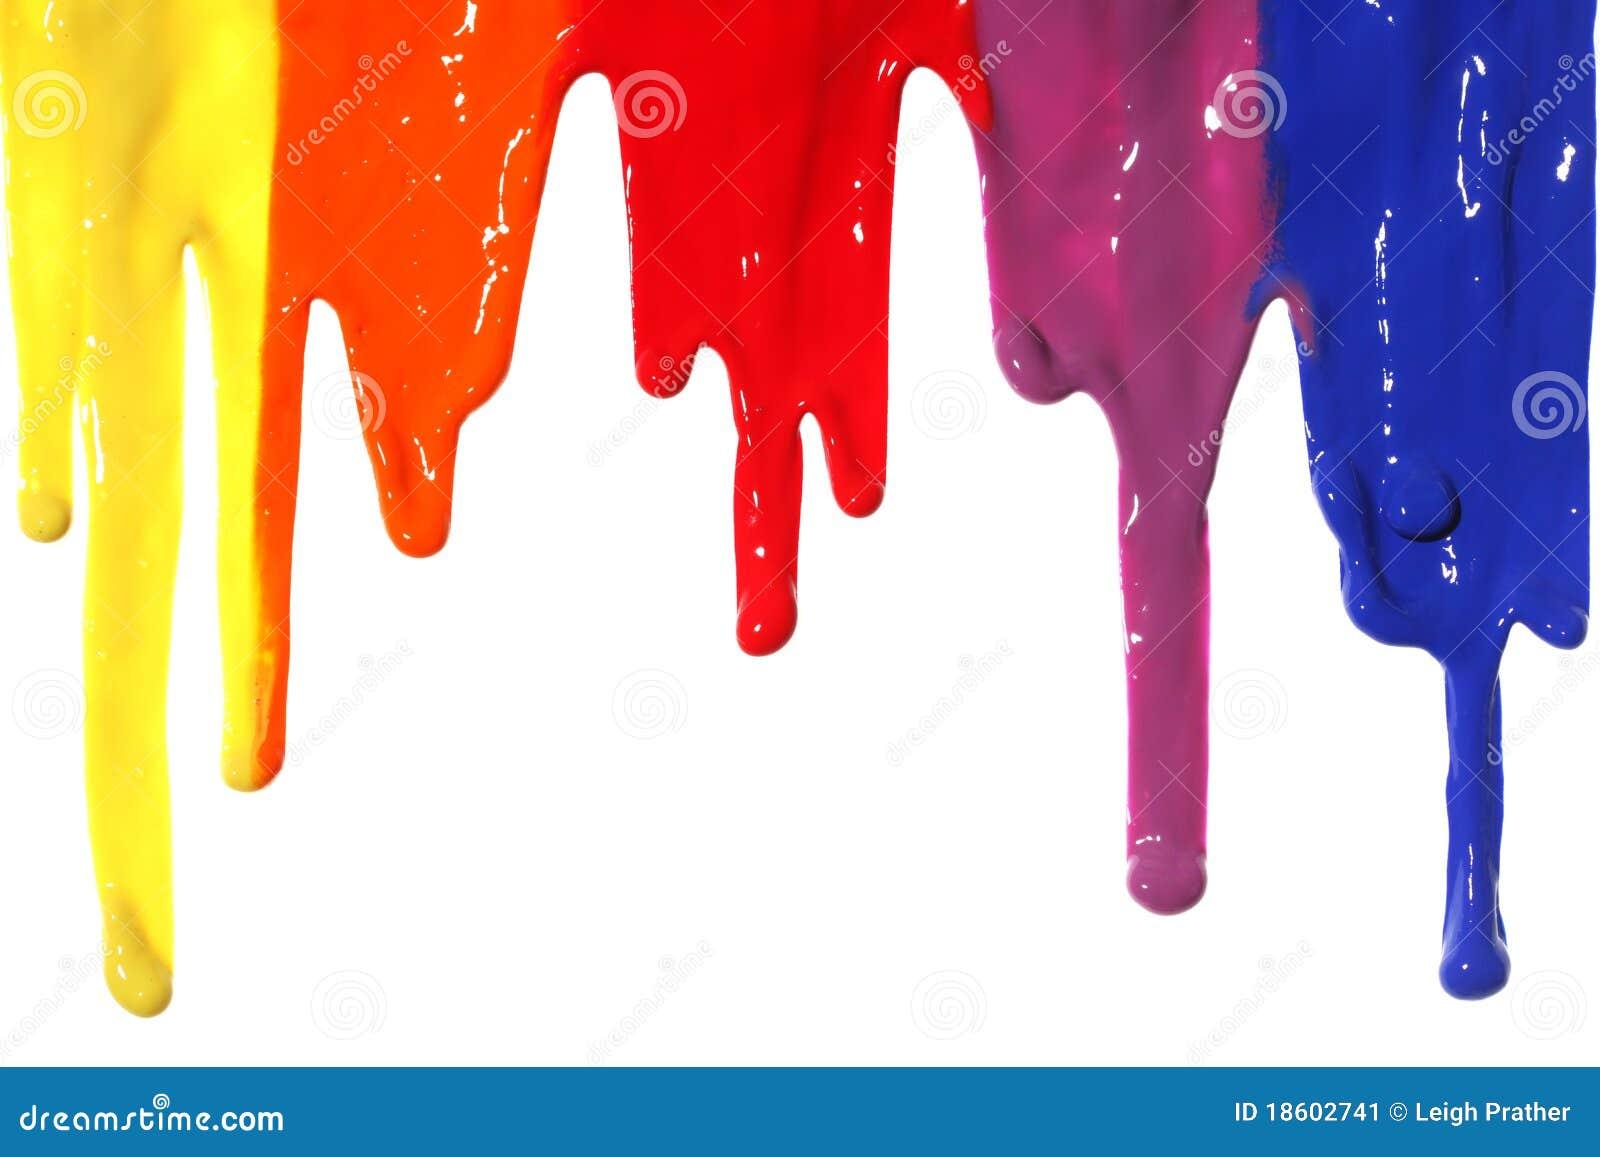 Genomblöt målarfärg